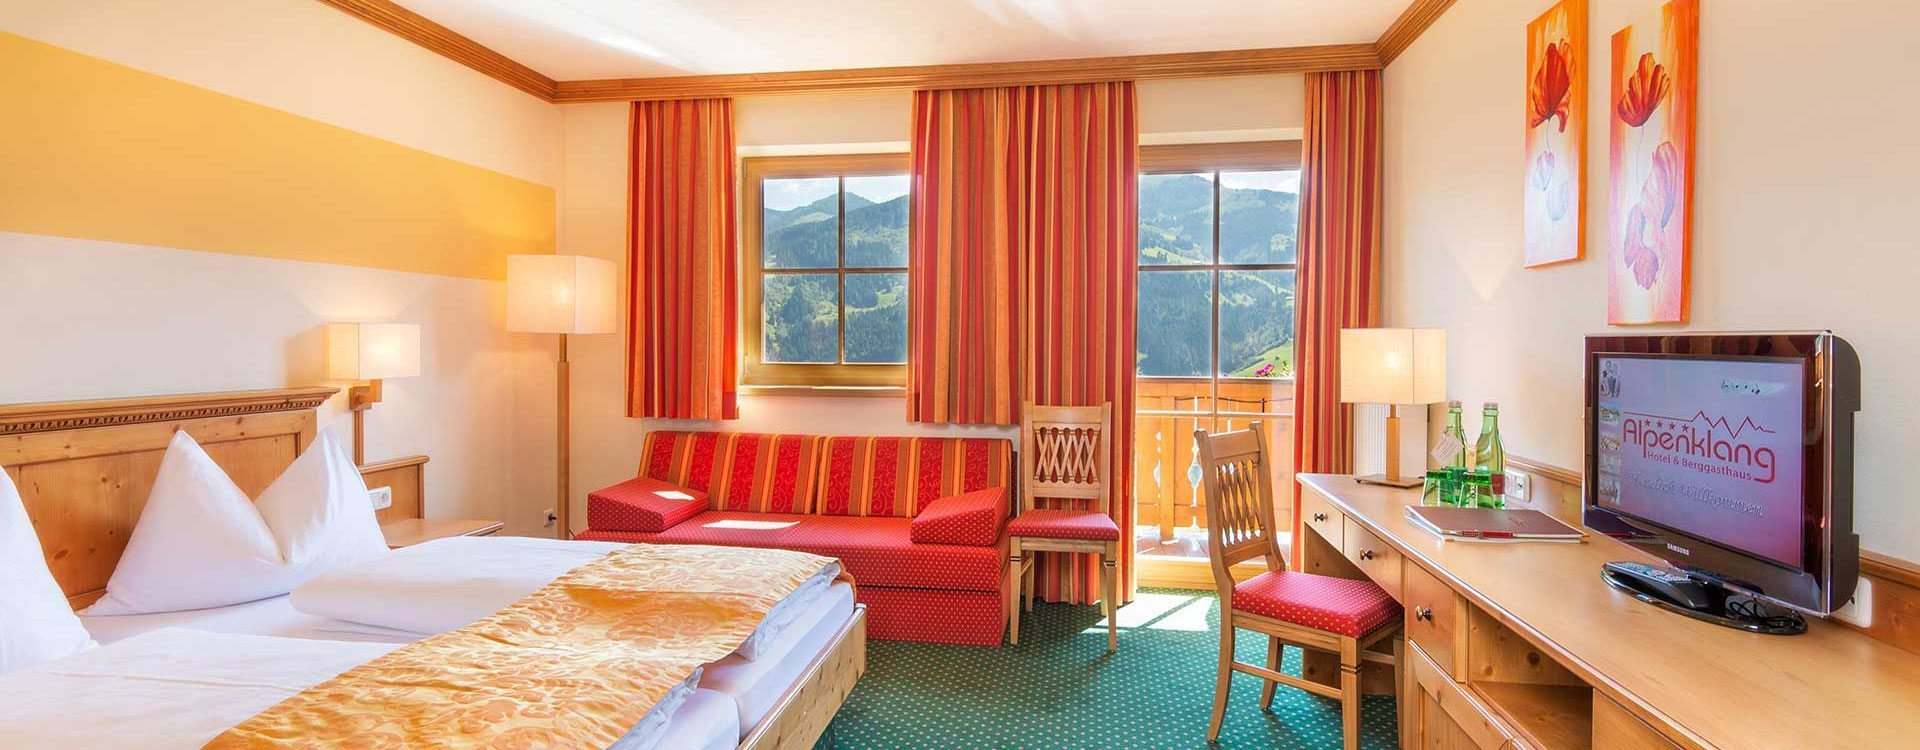 Zimmer in Großarl, Salzburger Land - Hotel Alpenklang